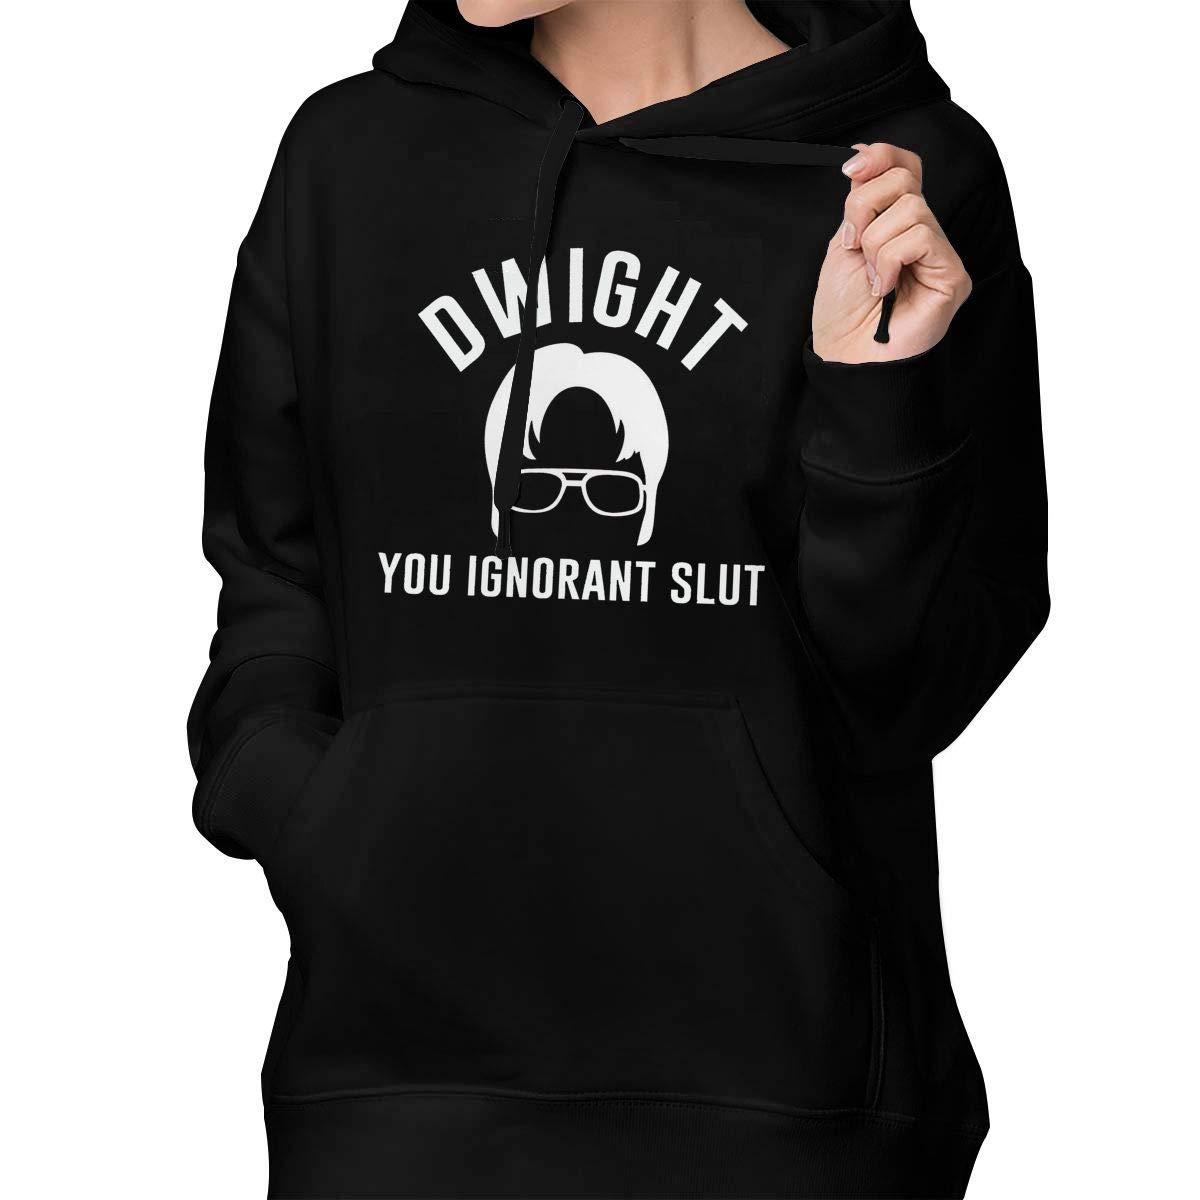 Woman S Classic Dwight You Ignorant Slut S 8455 Shirts